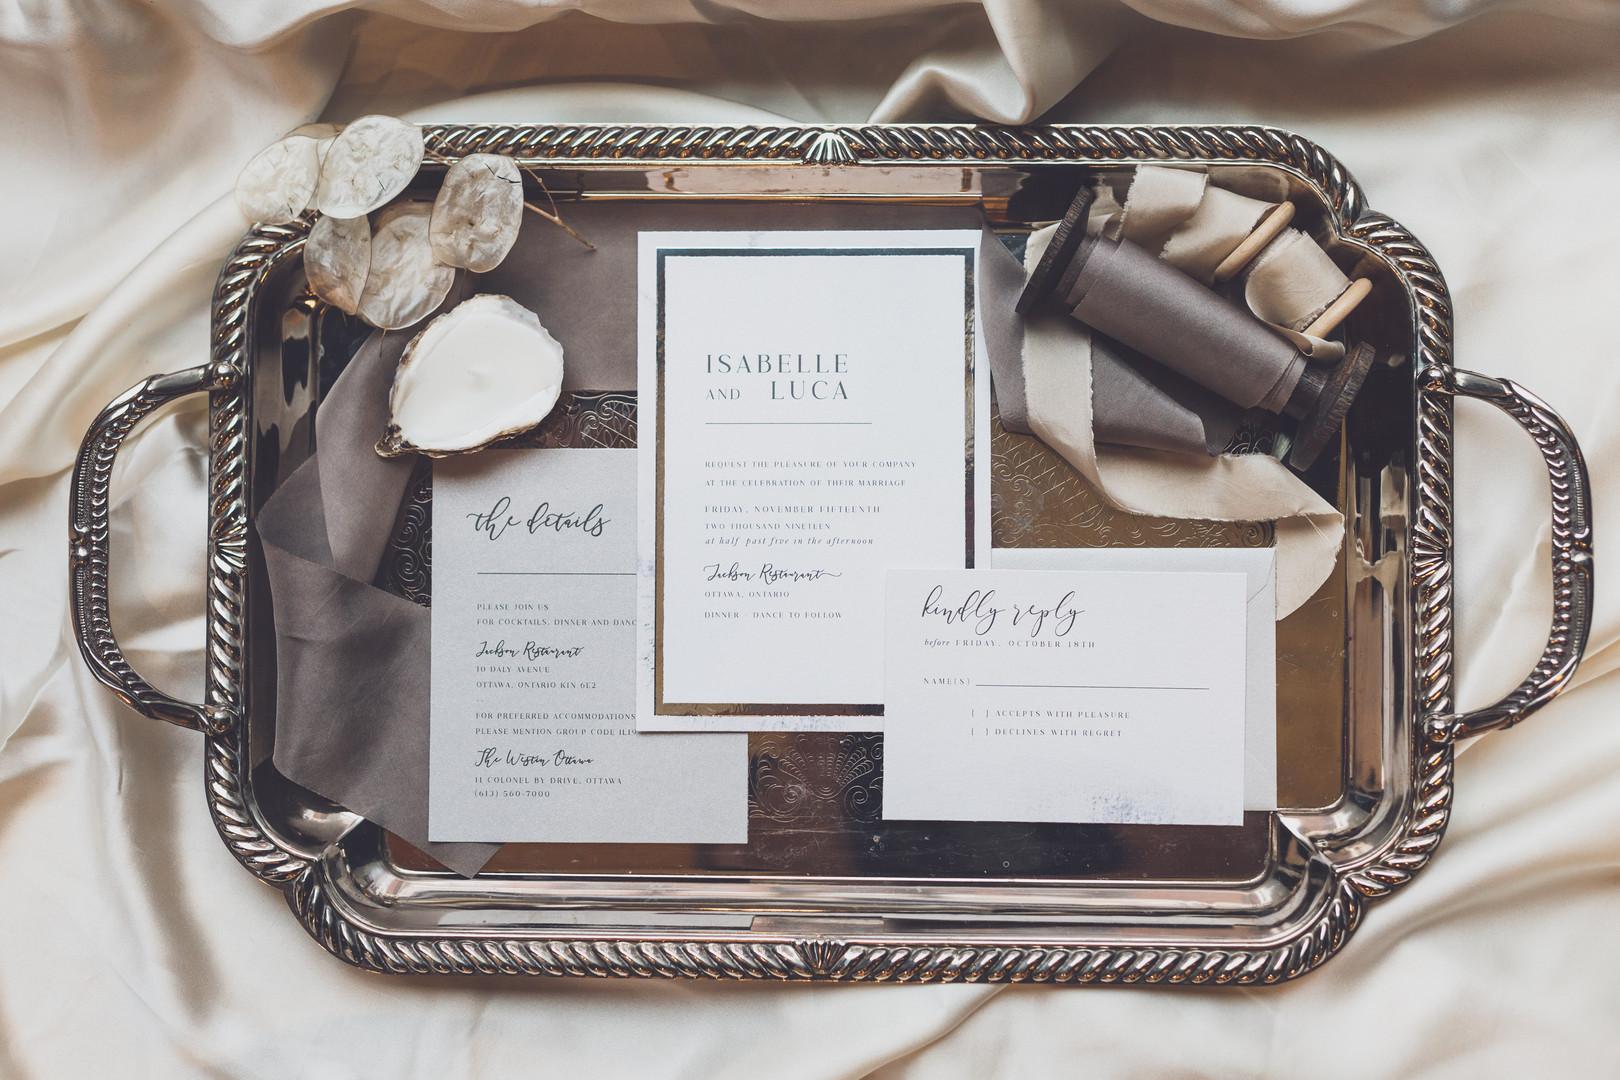 Wedding invitation with silk ribbon on a silver tray